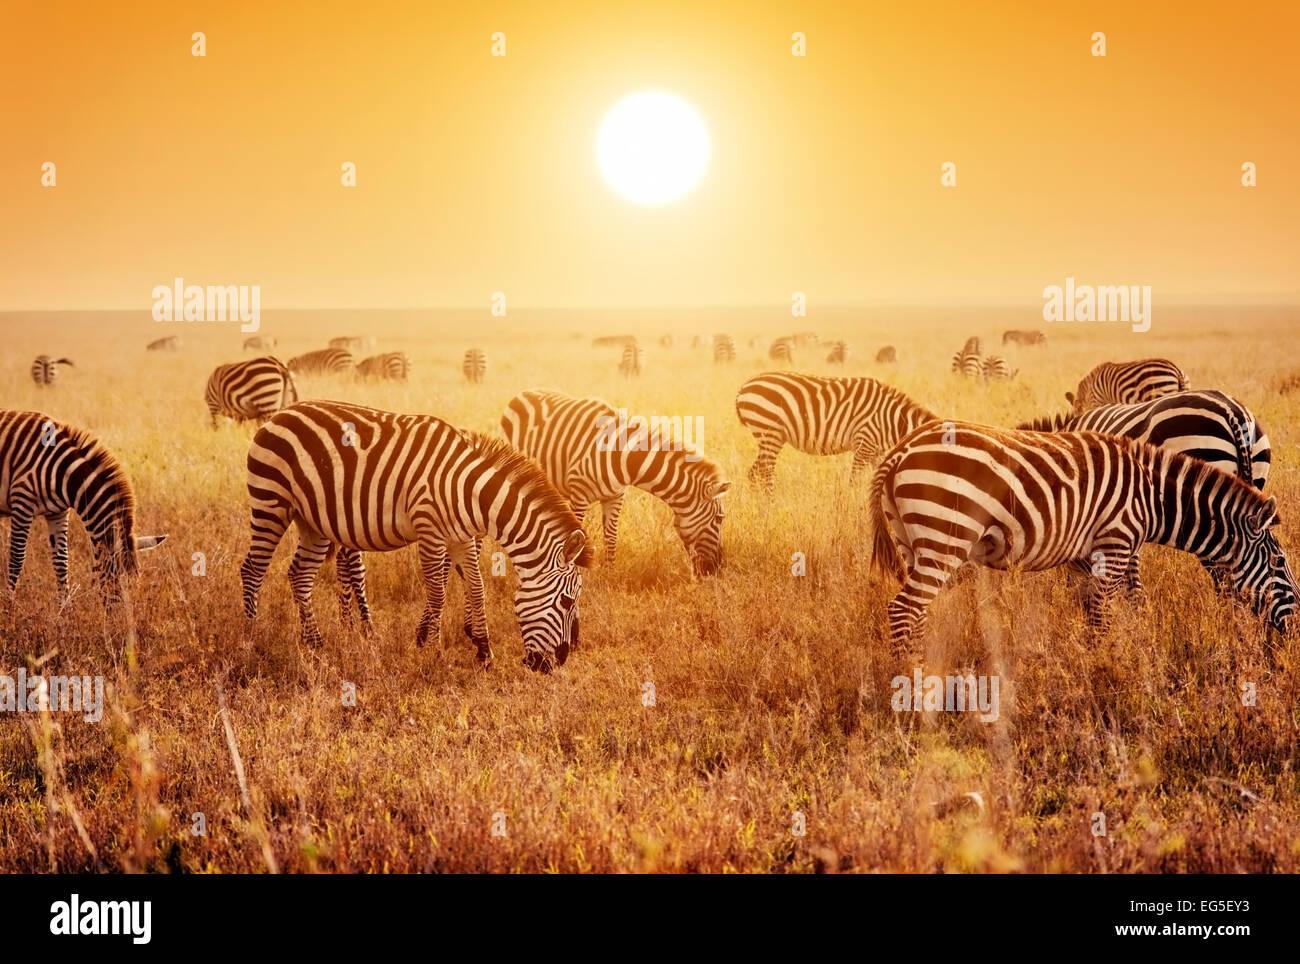 Zebras herd on savanna at sunset, Africa. Safari in Serengeti, Tanzania - Stock Image